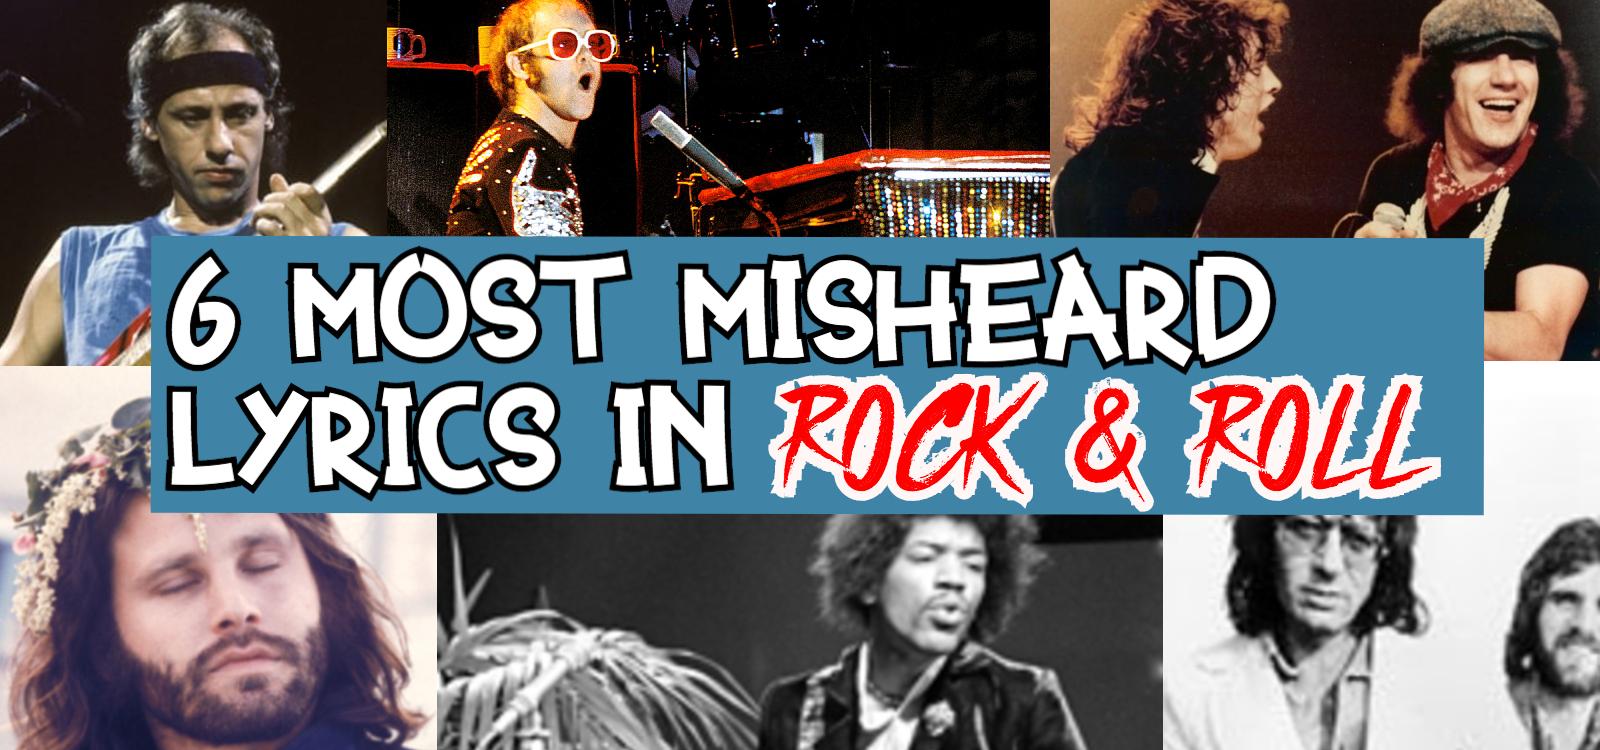 A montage of Jimi Hendrix, Jim Morrison, Mark Knopler, Elton John, Angus Young and Brian Johnson